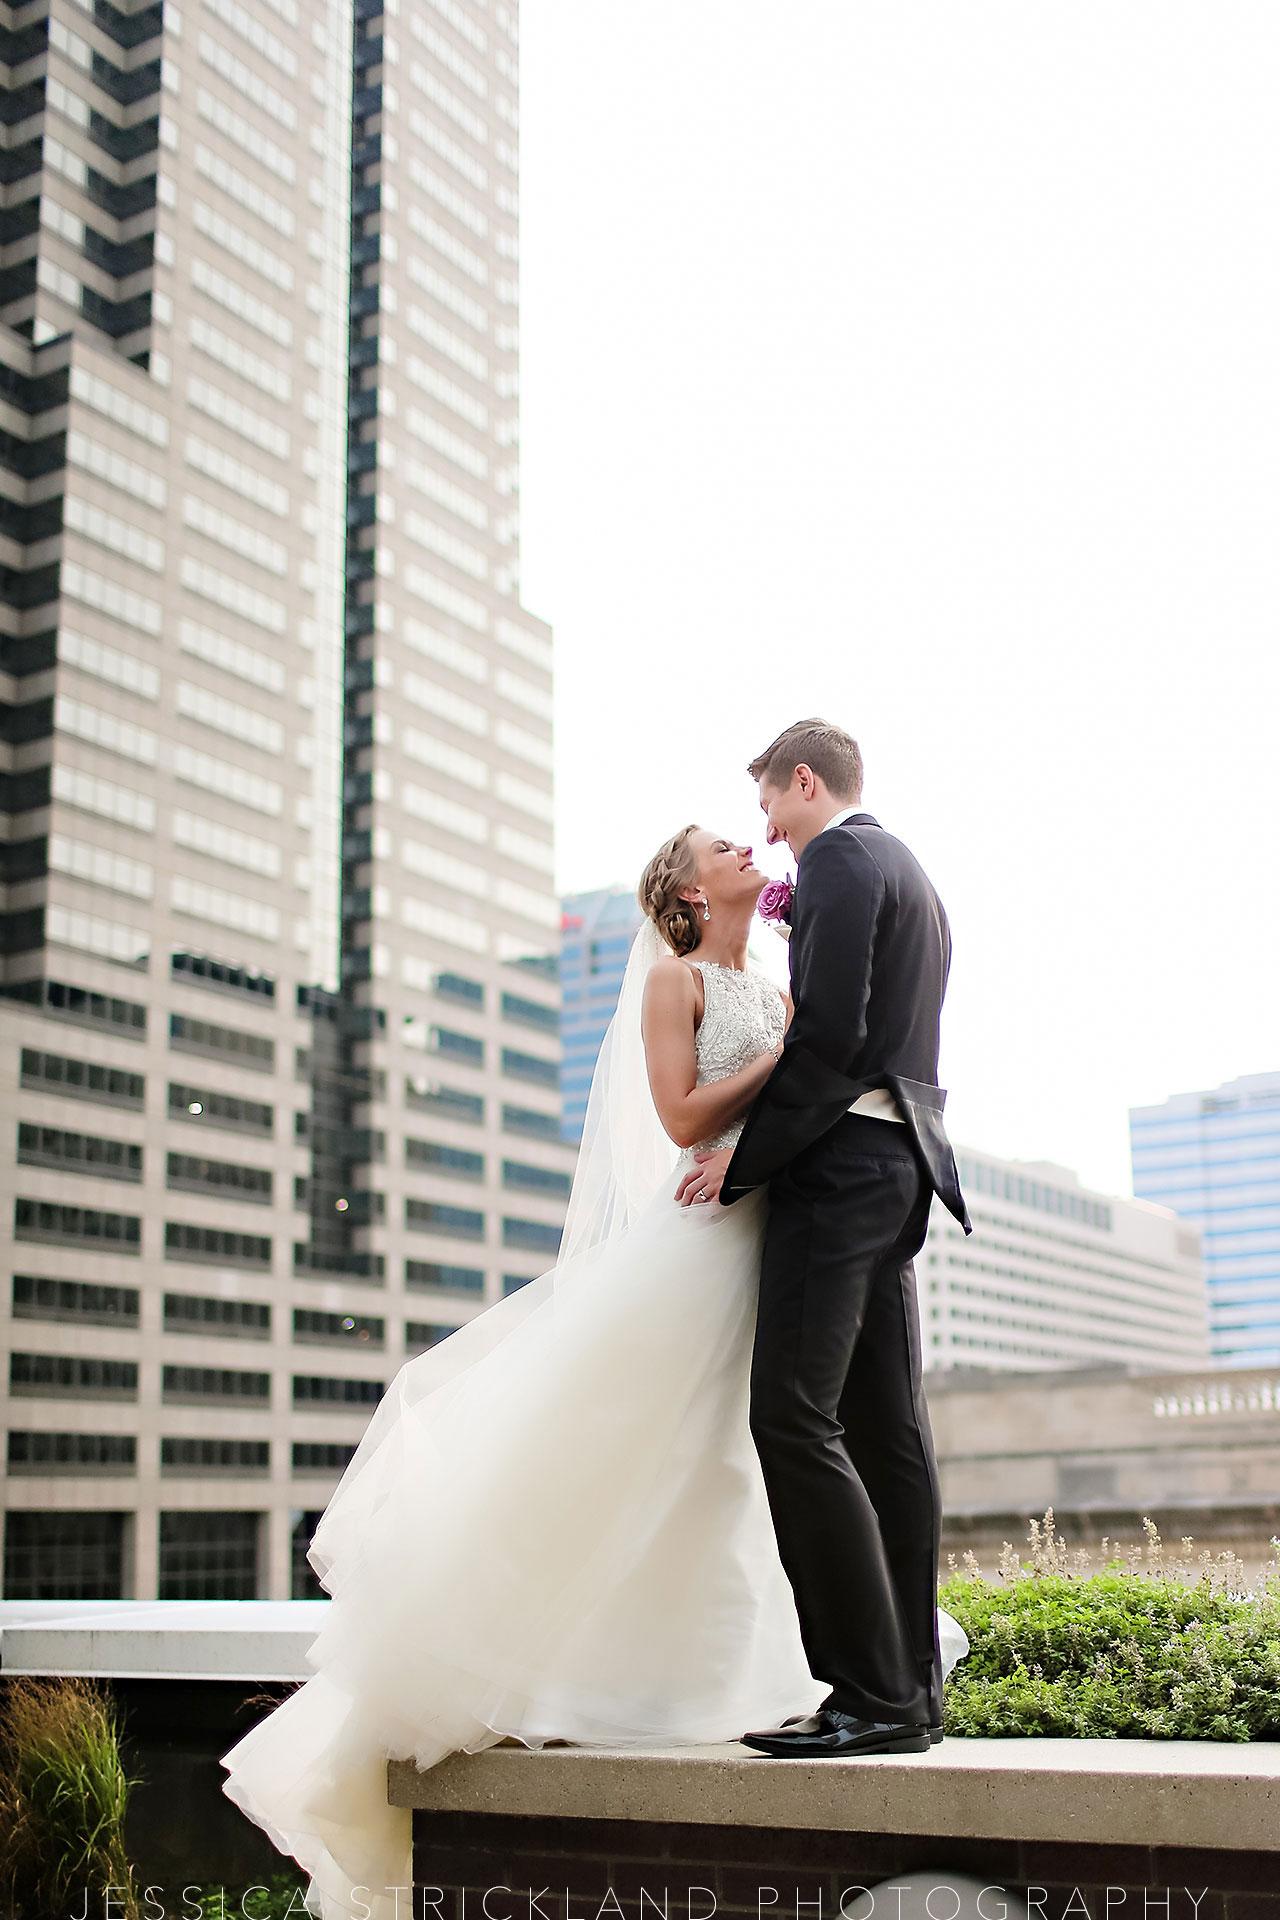 Serra Alex Regions Tower Indianapolis Wedding 249 watermarked